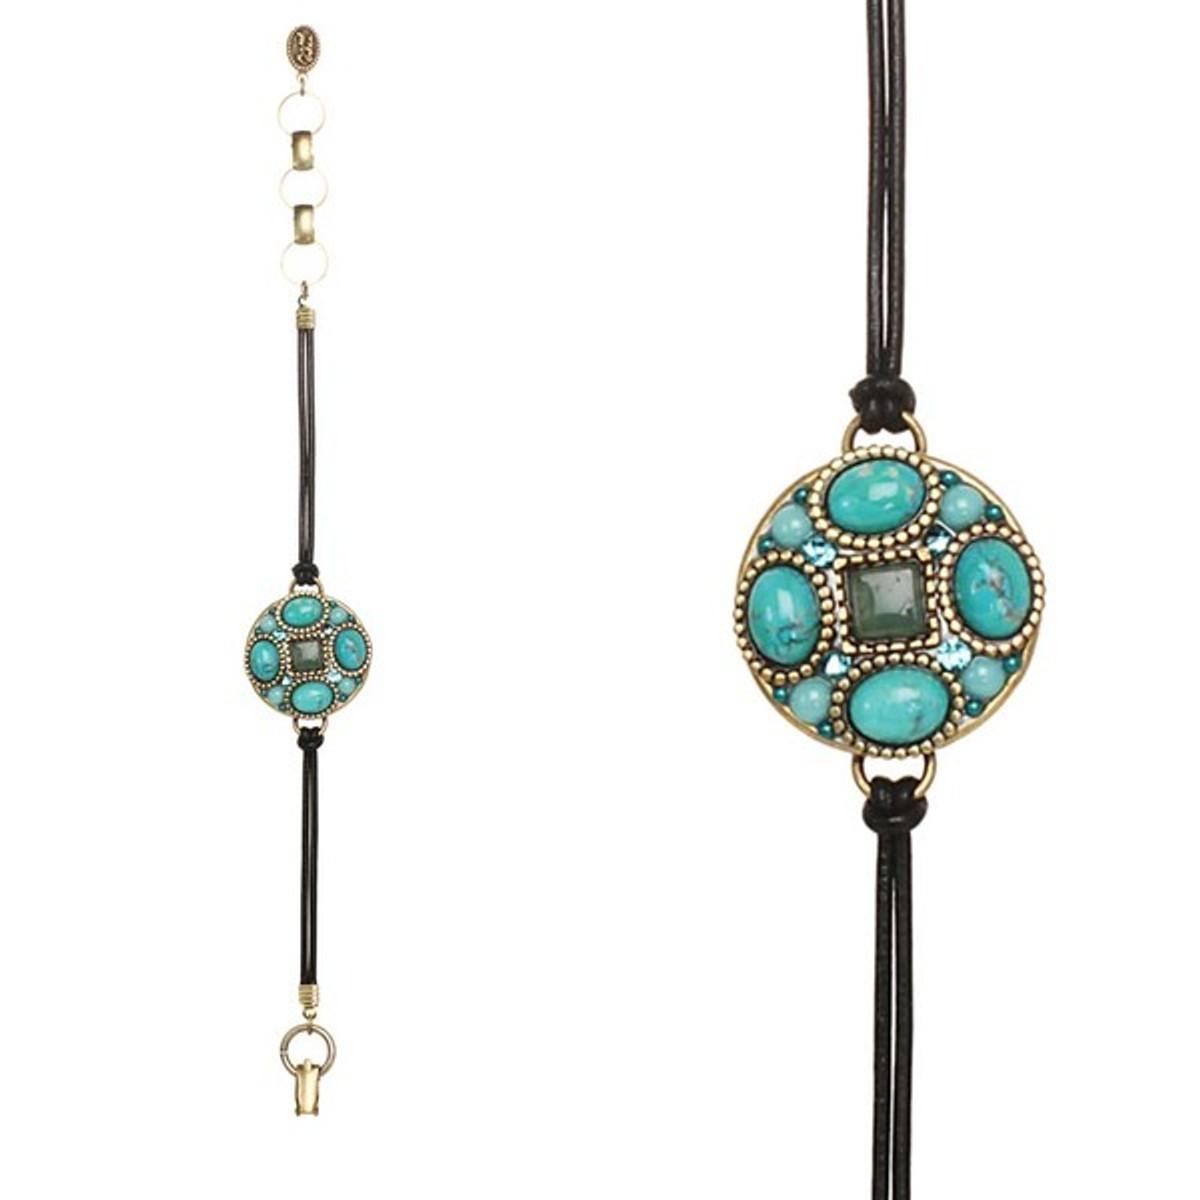 Nile bracelet from Michal Golan Jewelry